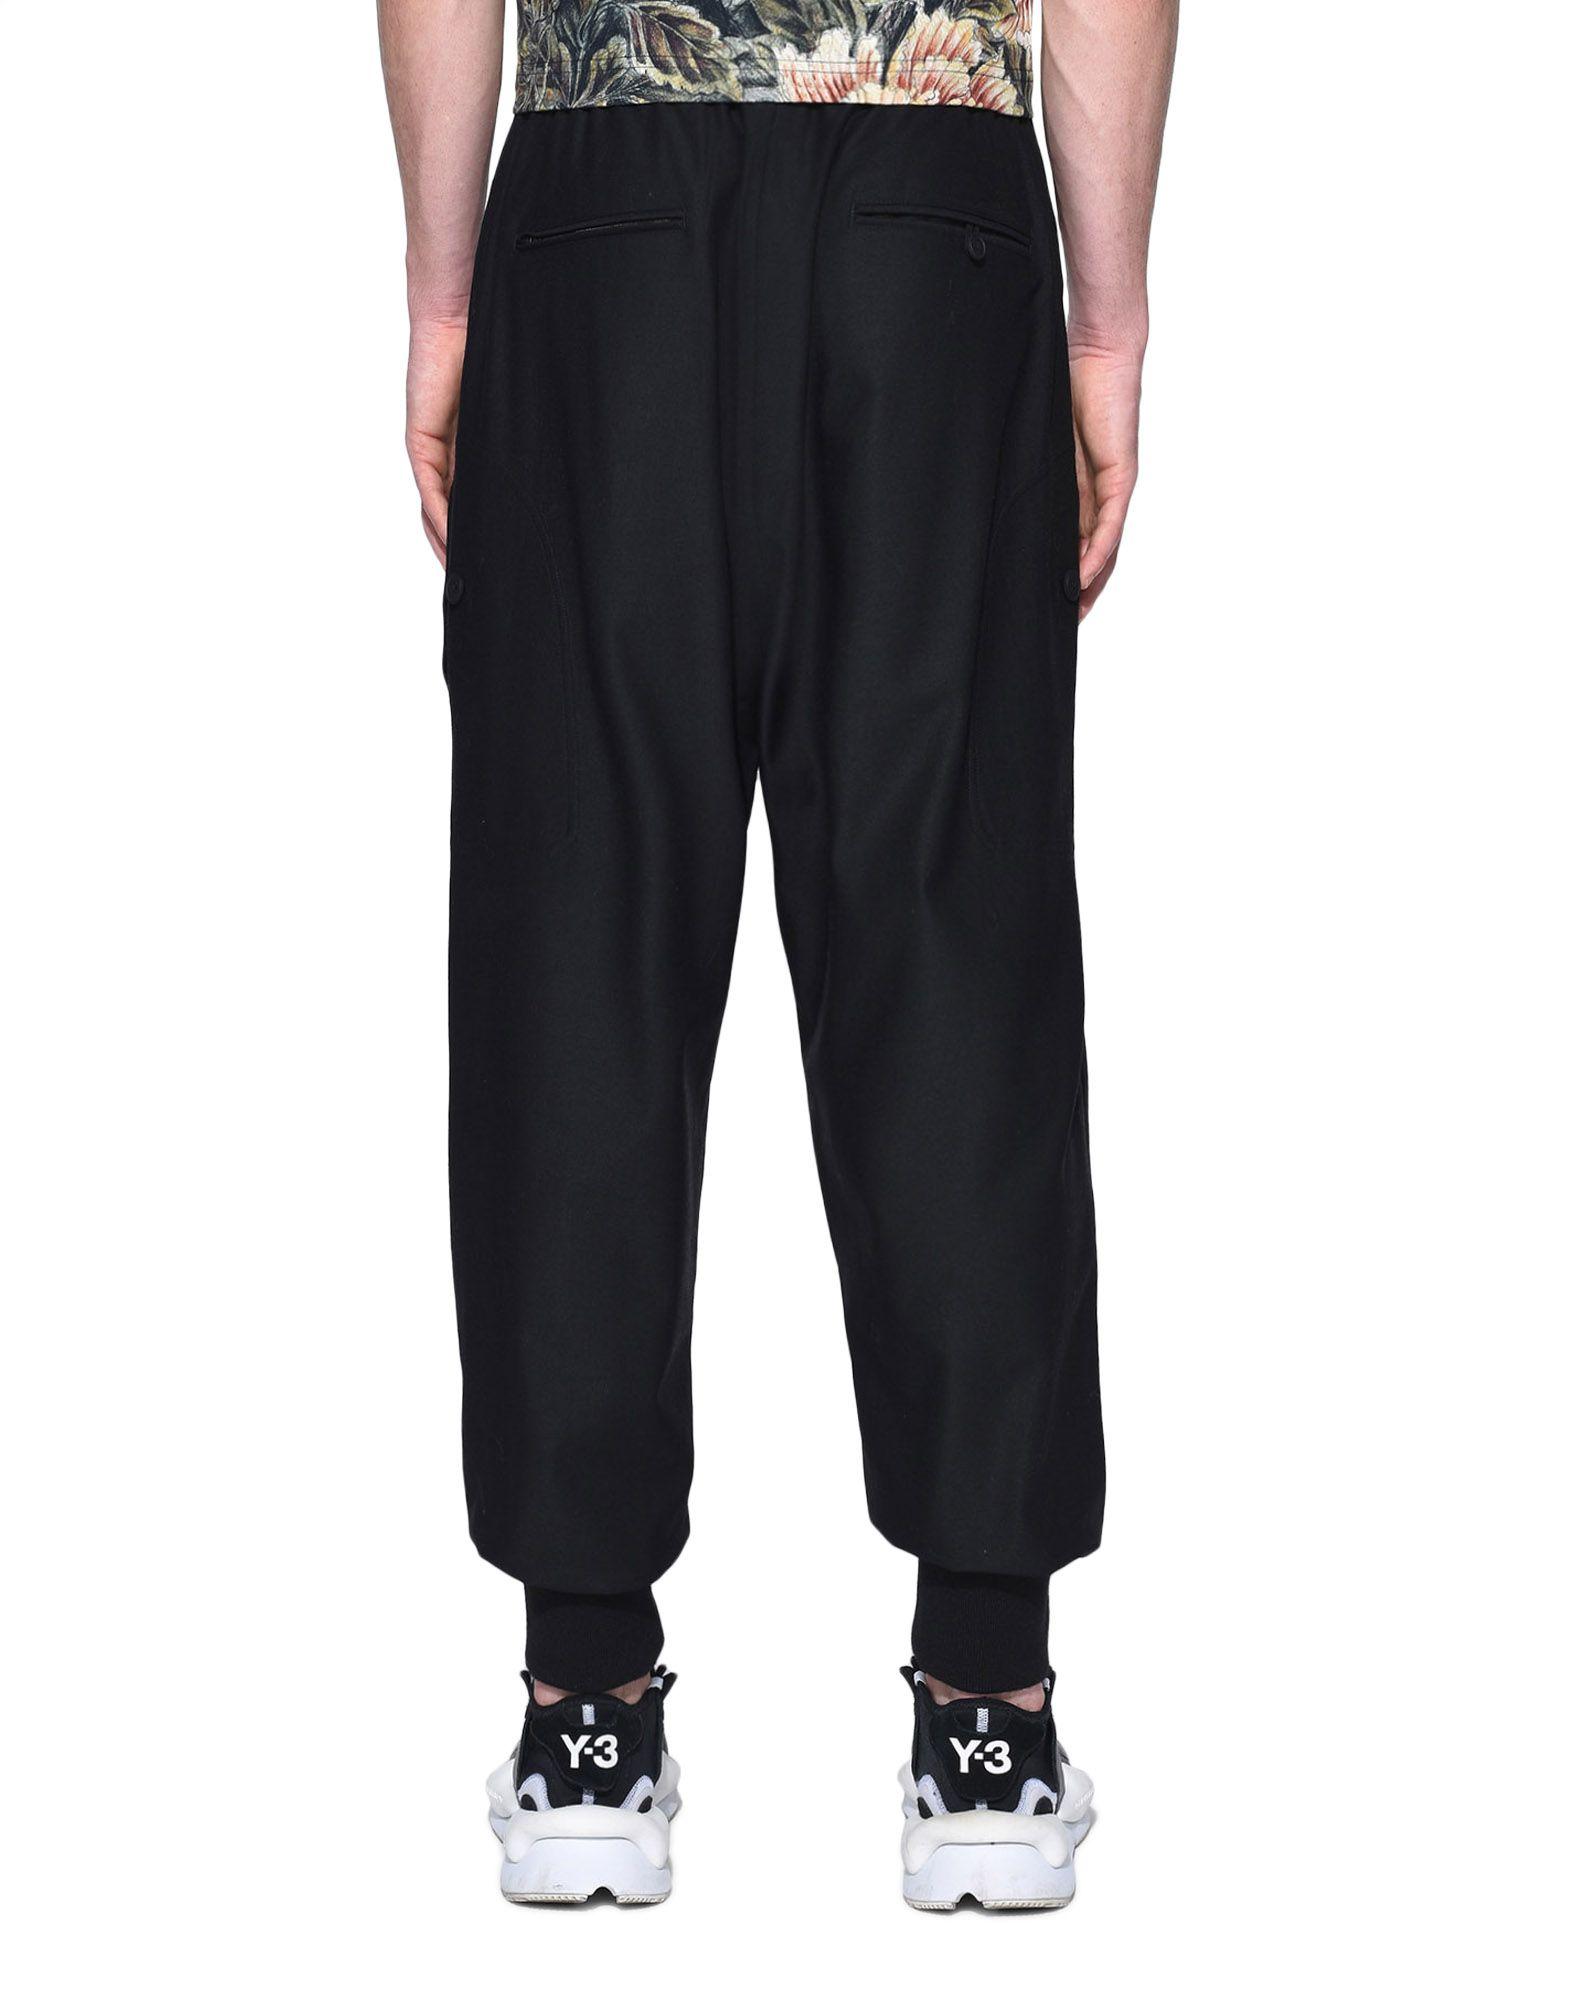 Y-3 Y-3 Quilted Pants Hose Herren d